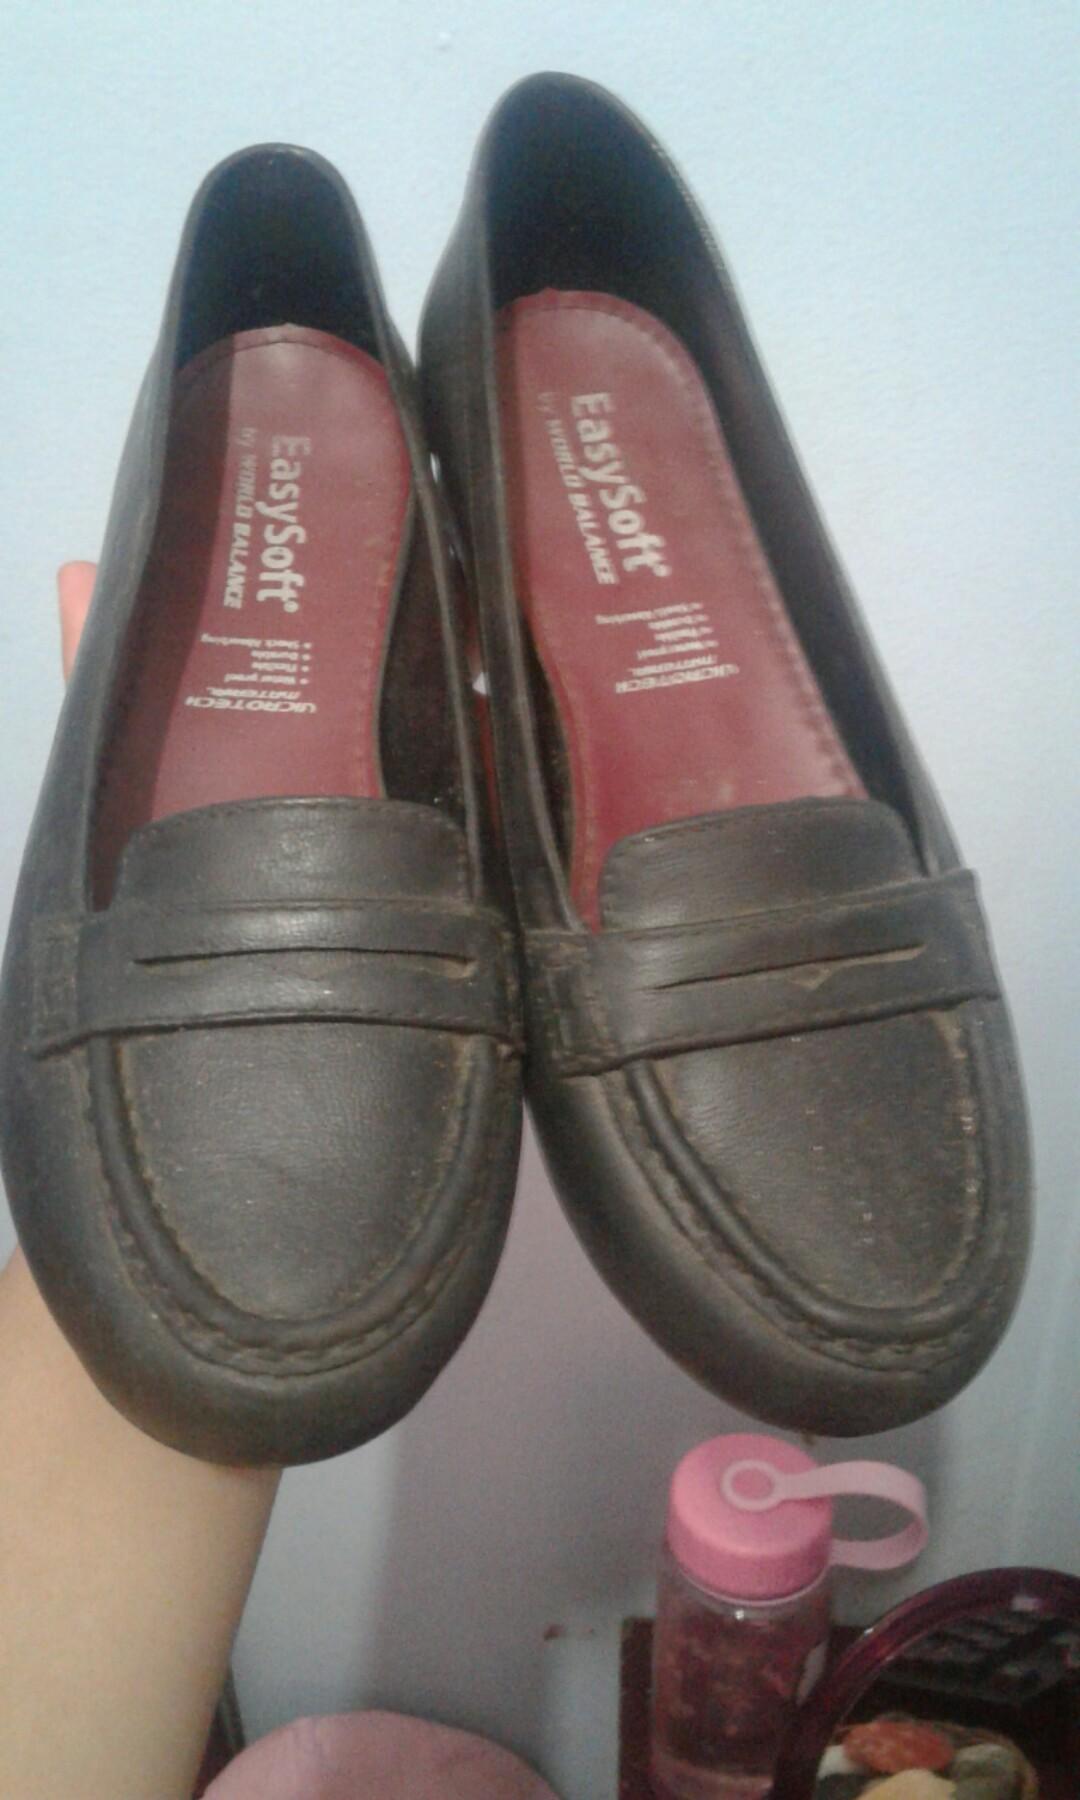 World balance waterproof school shoes